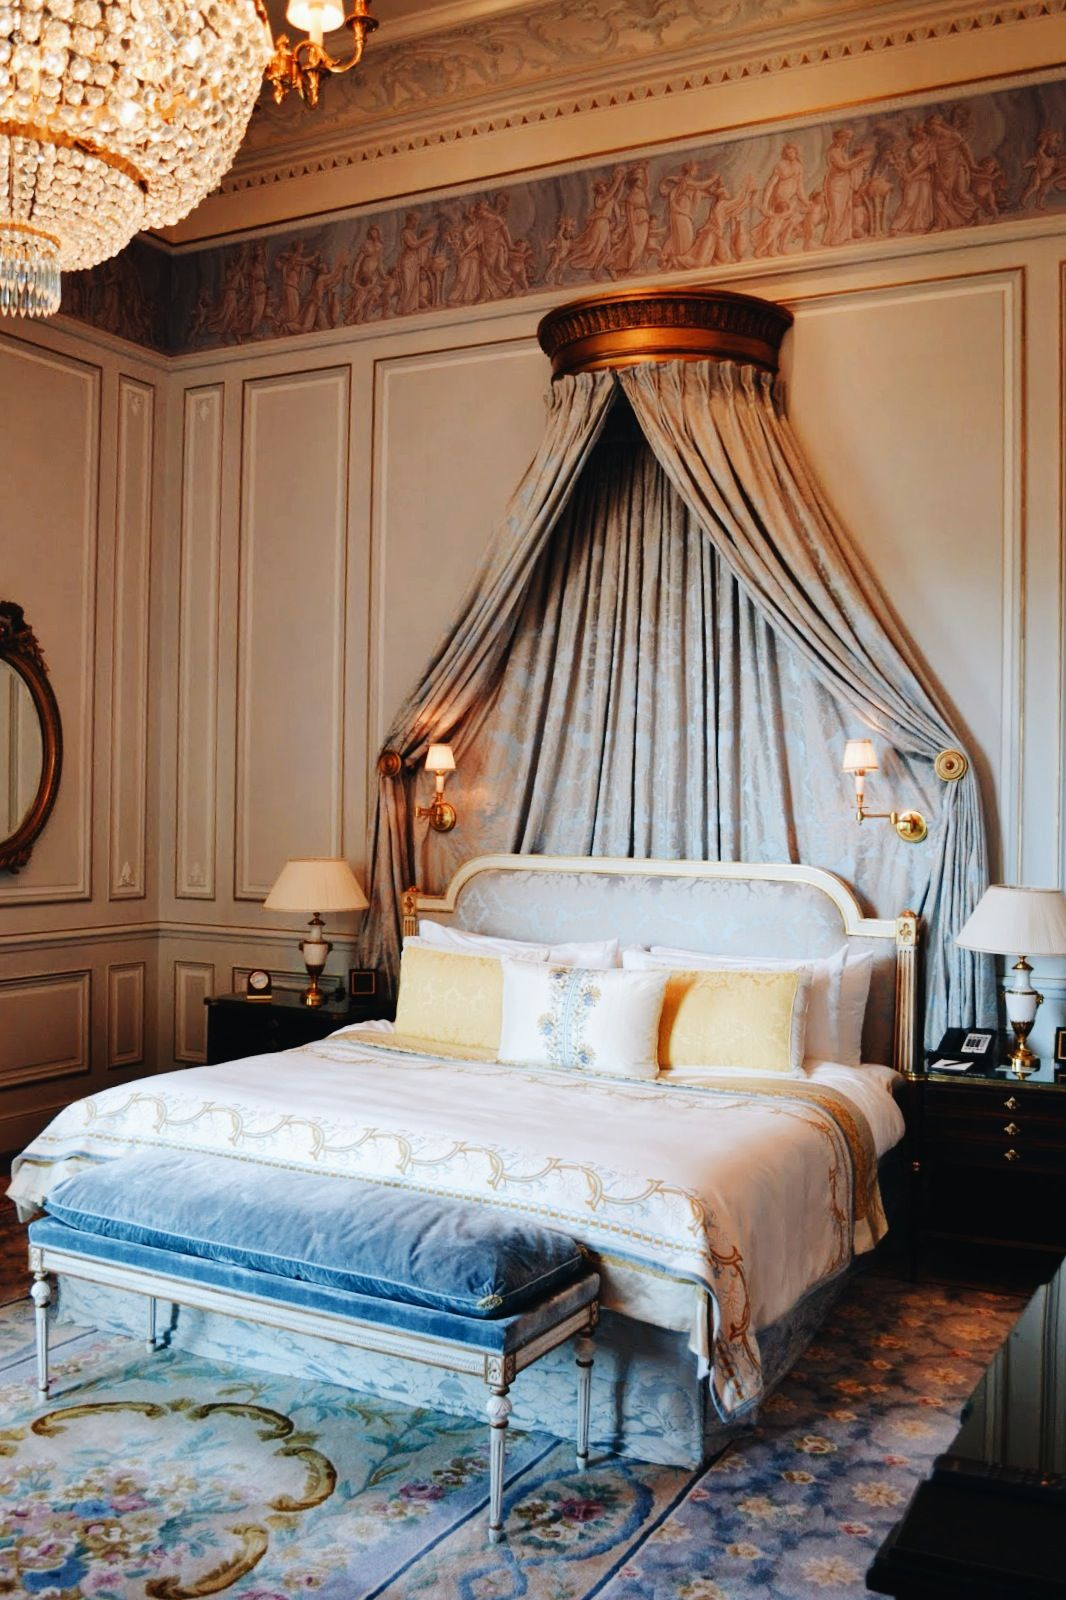 Luxury Hotel Bedrooms: Luxurious Bedrooms, Luxury Interior